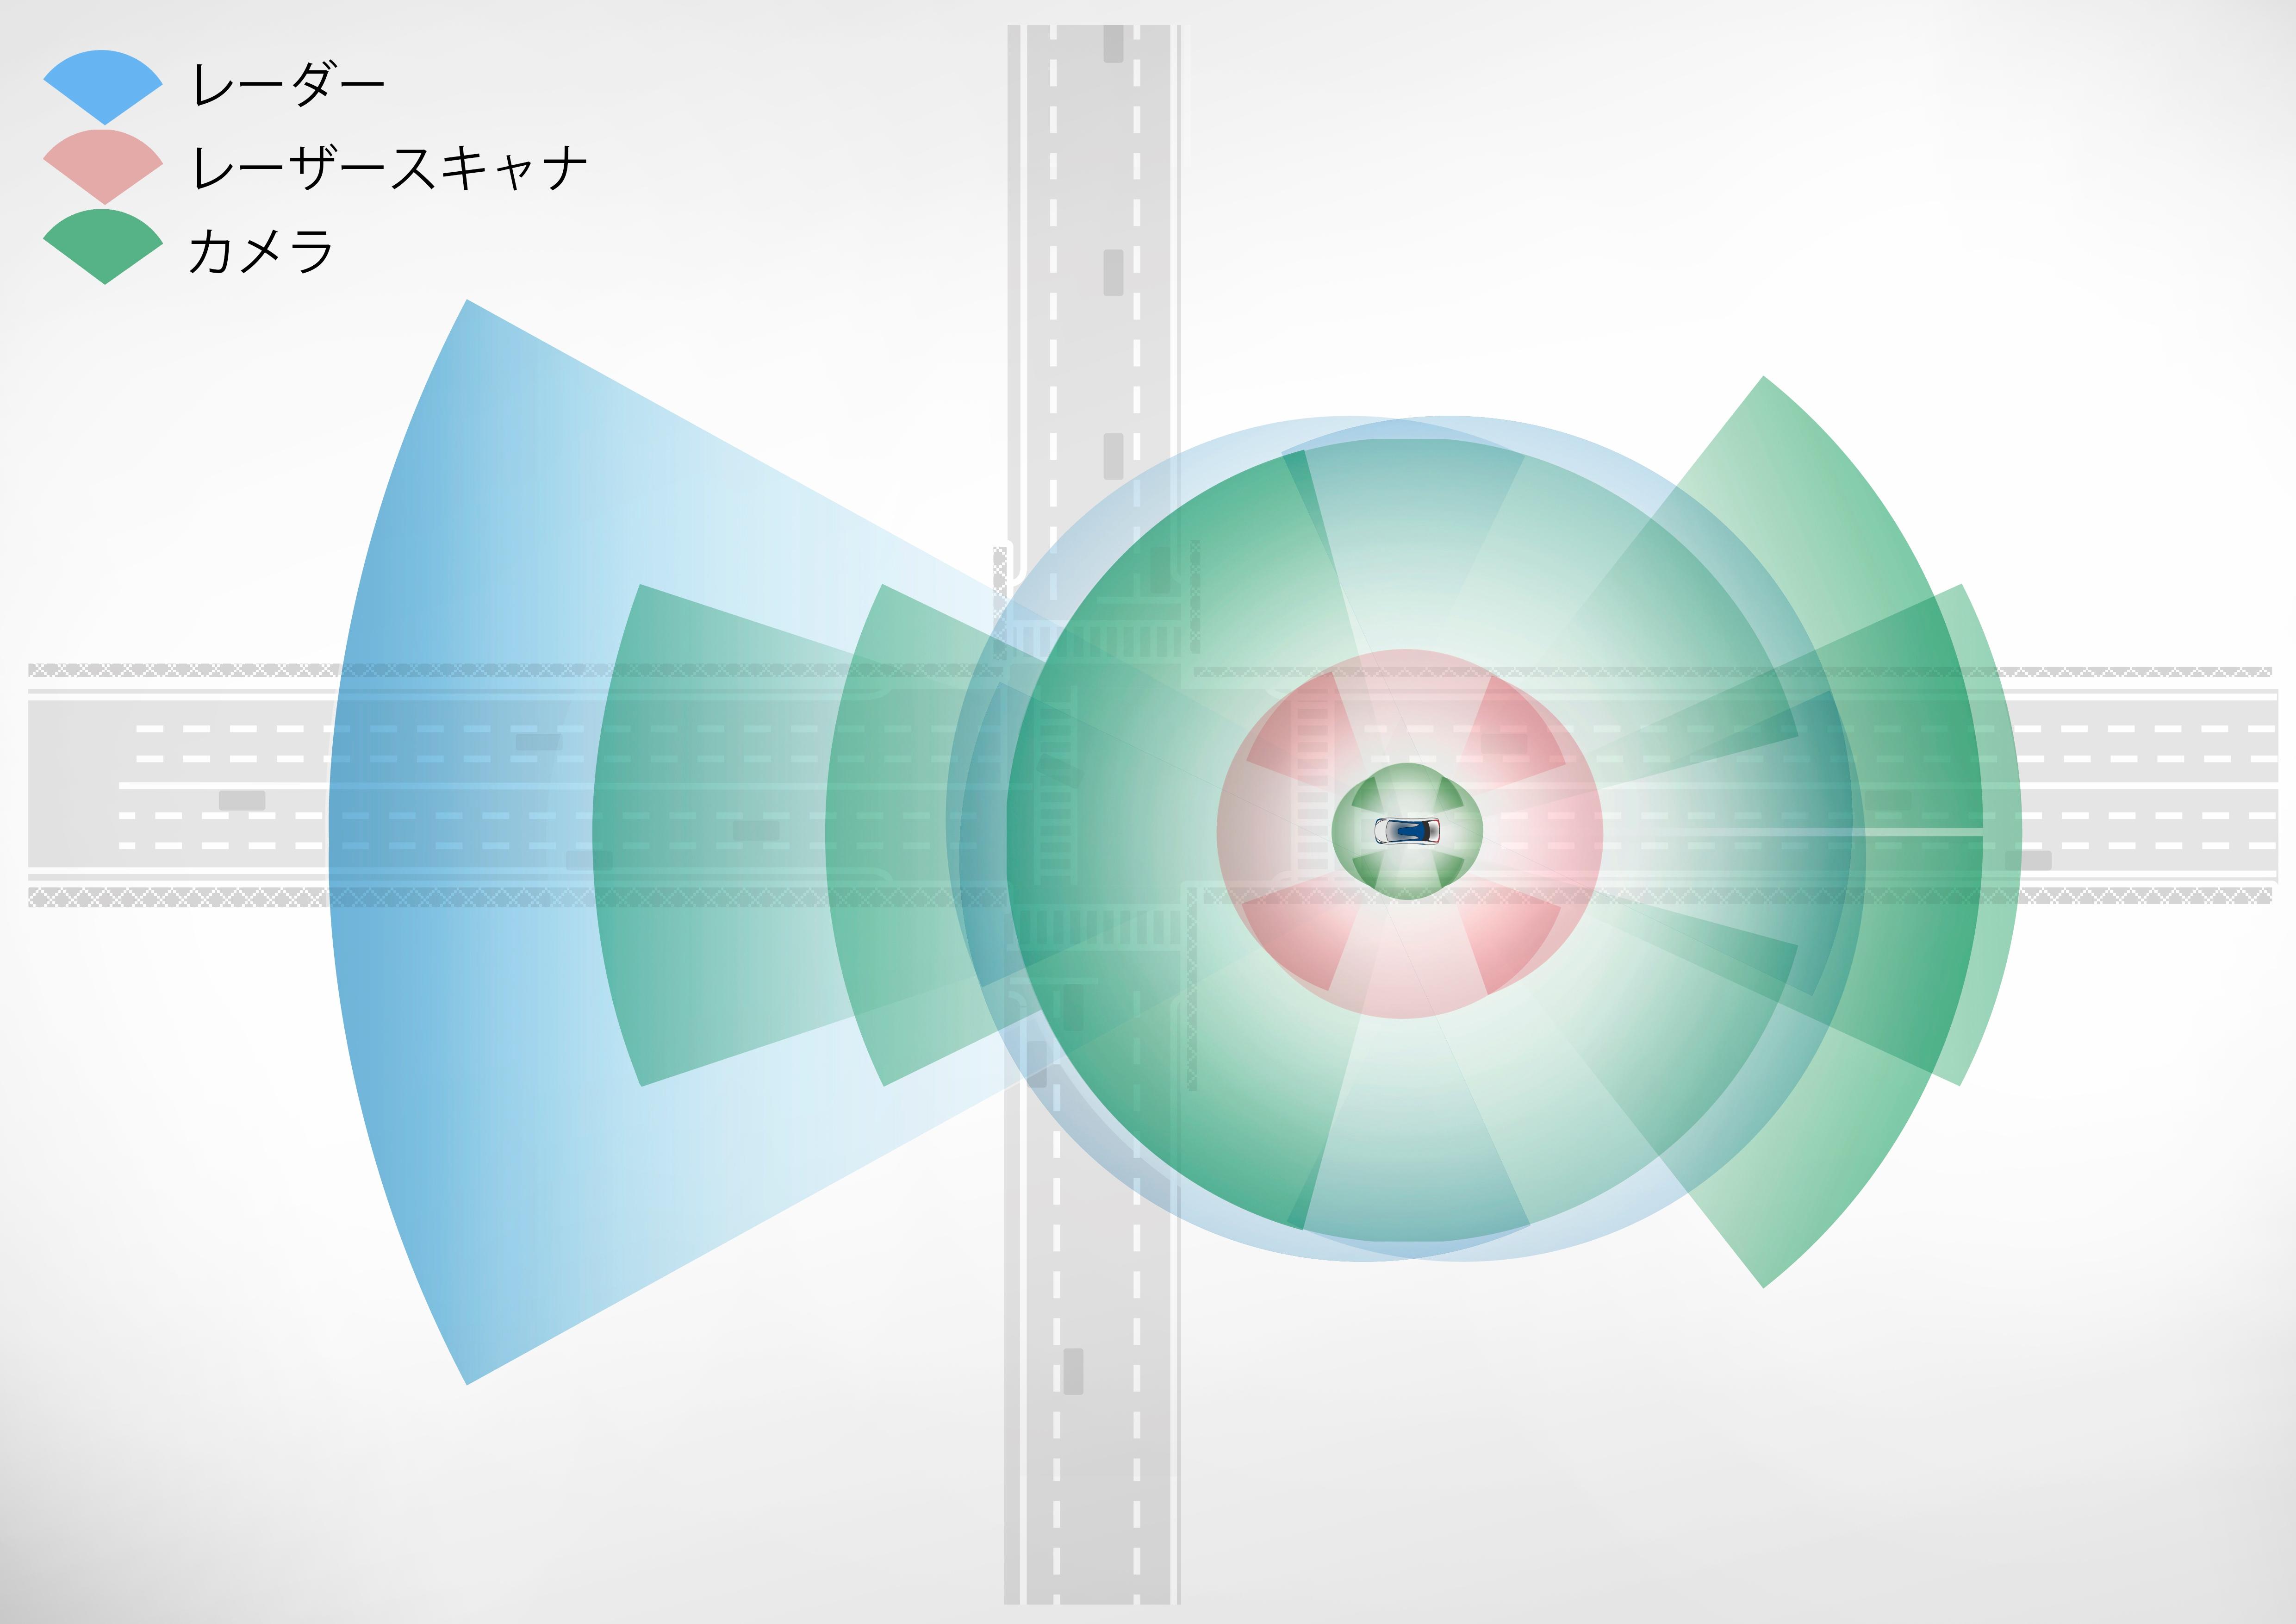 Hintergrundbilder : Illustration, Text, Logo, Grafikdesign, Nissan ...